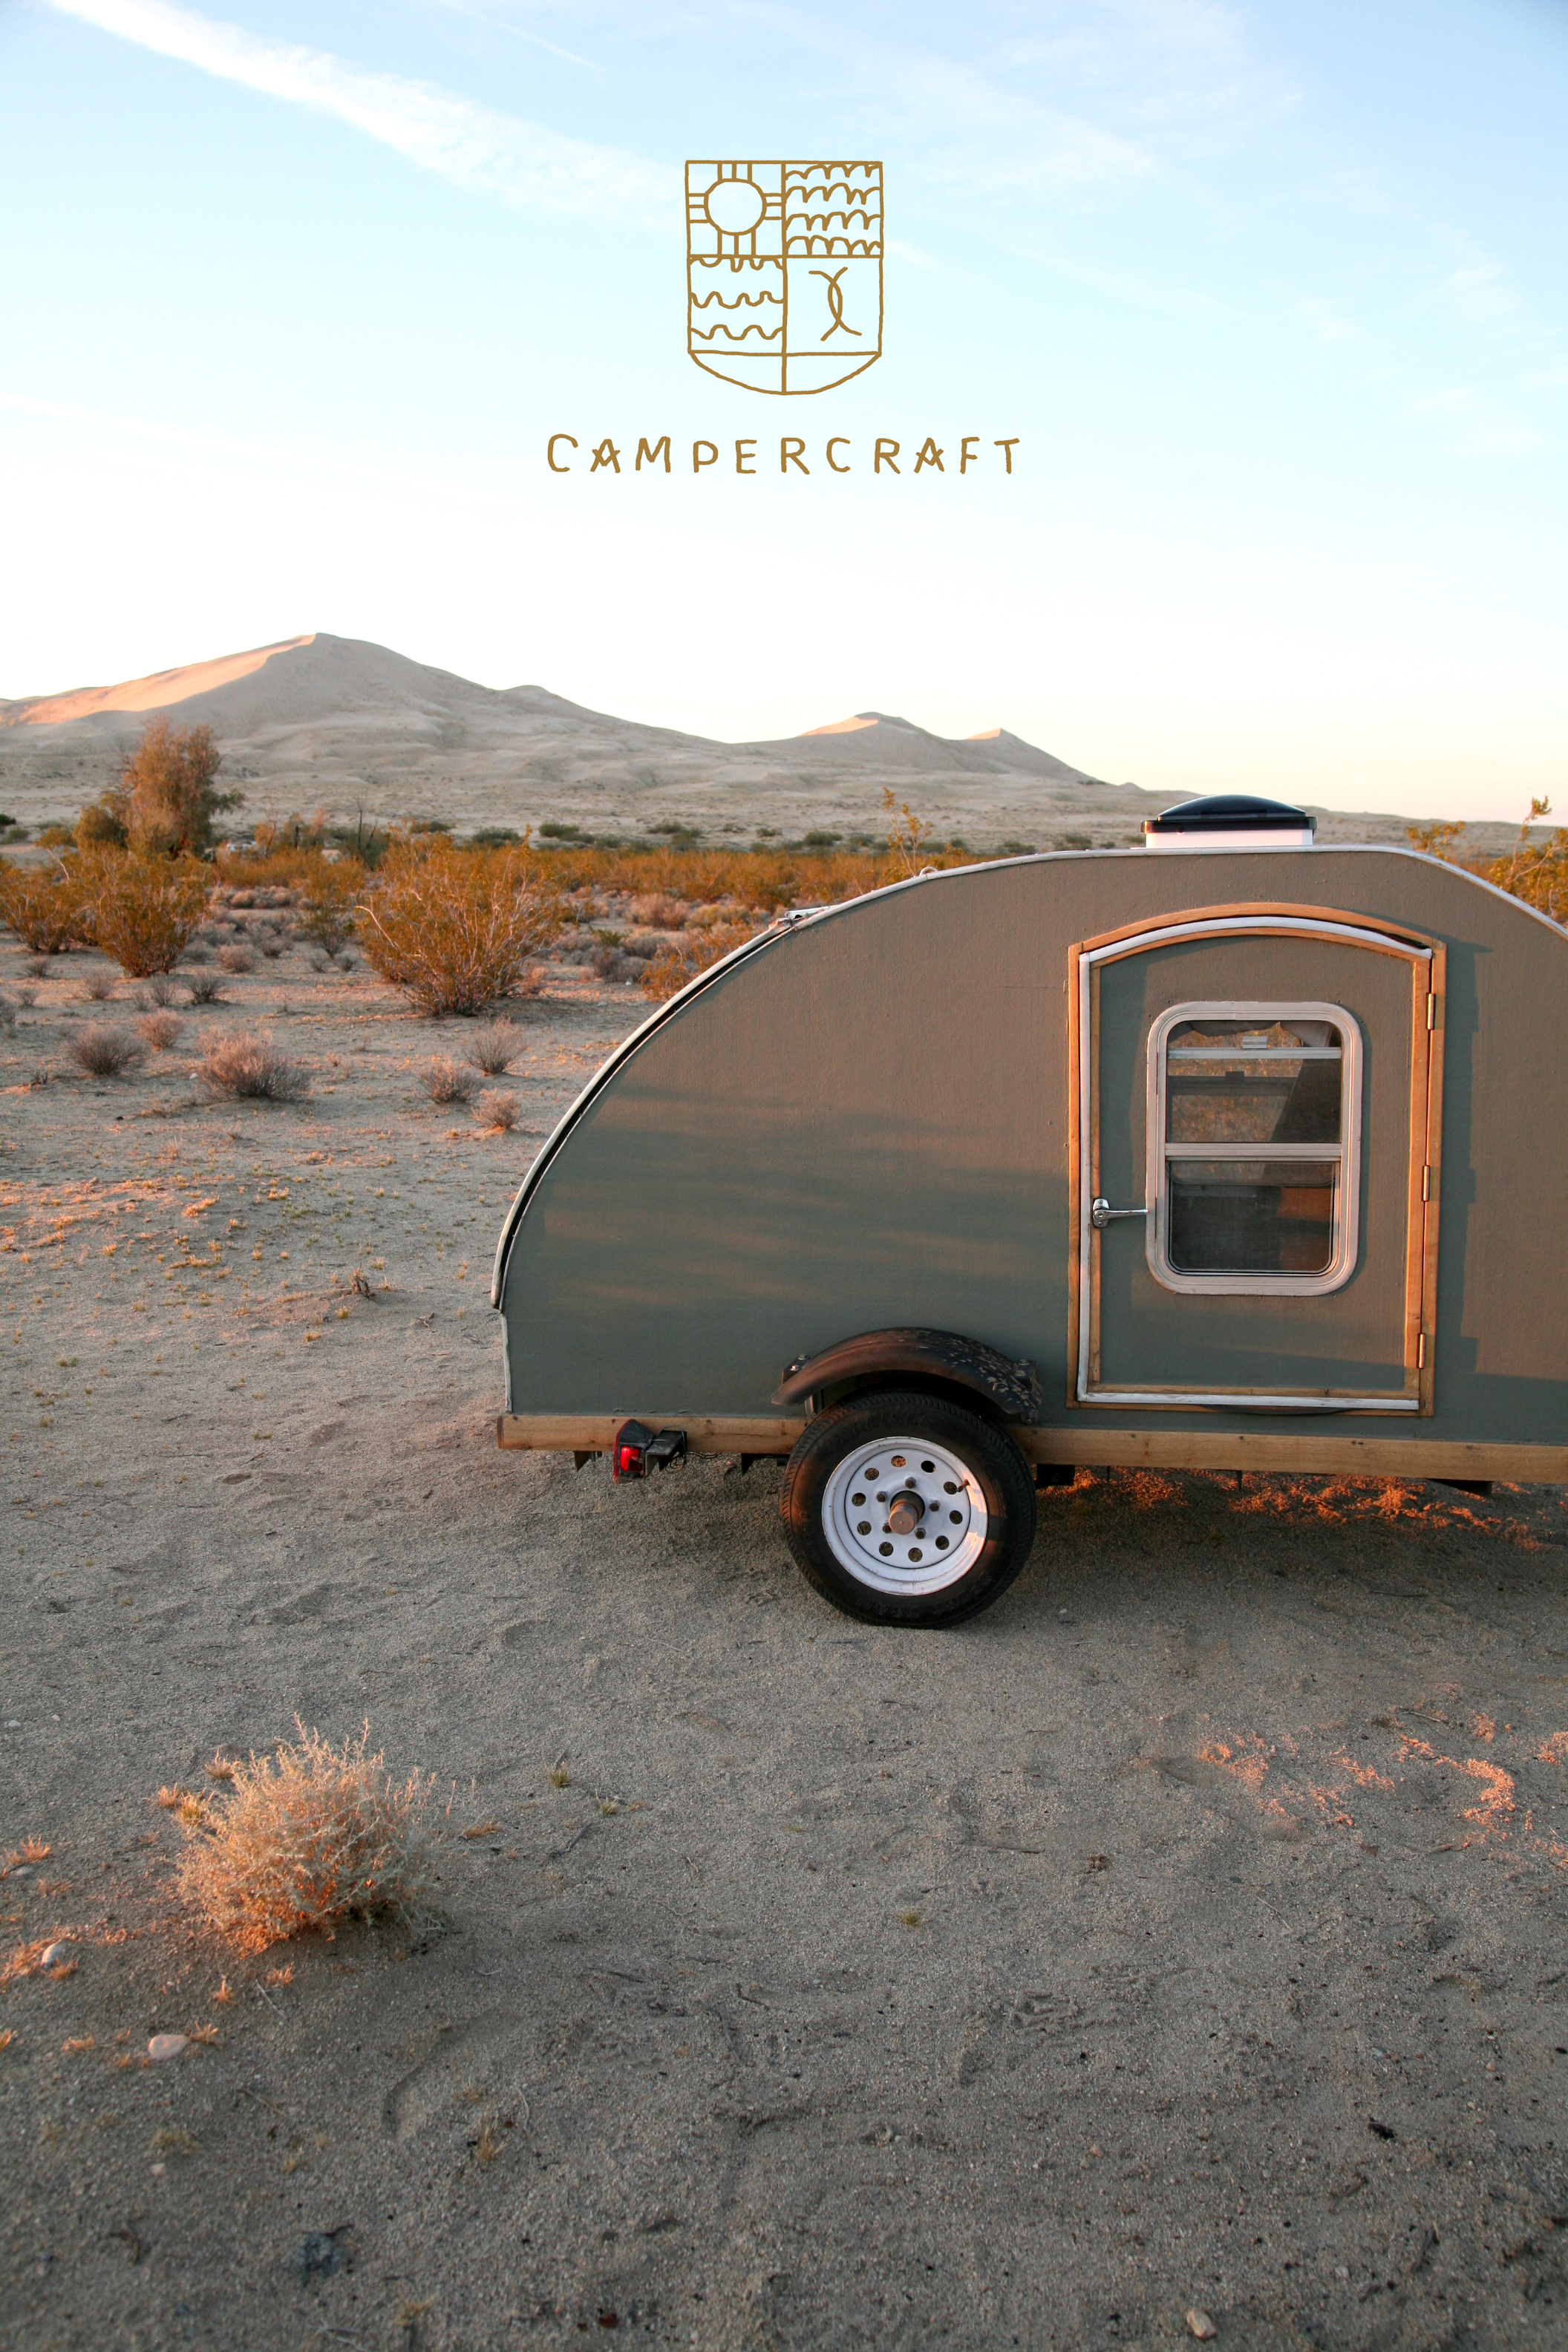 campercraft.jpg